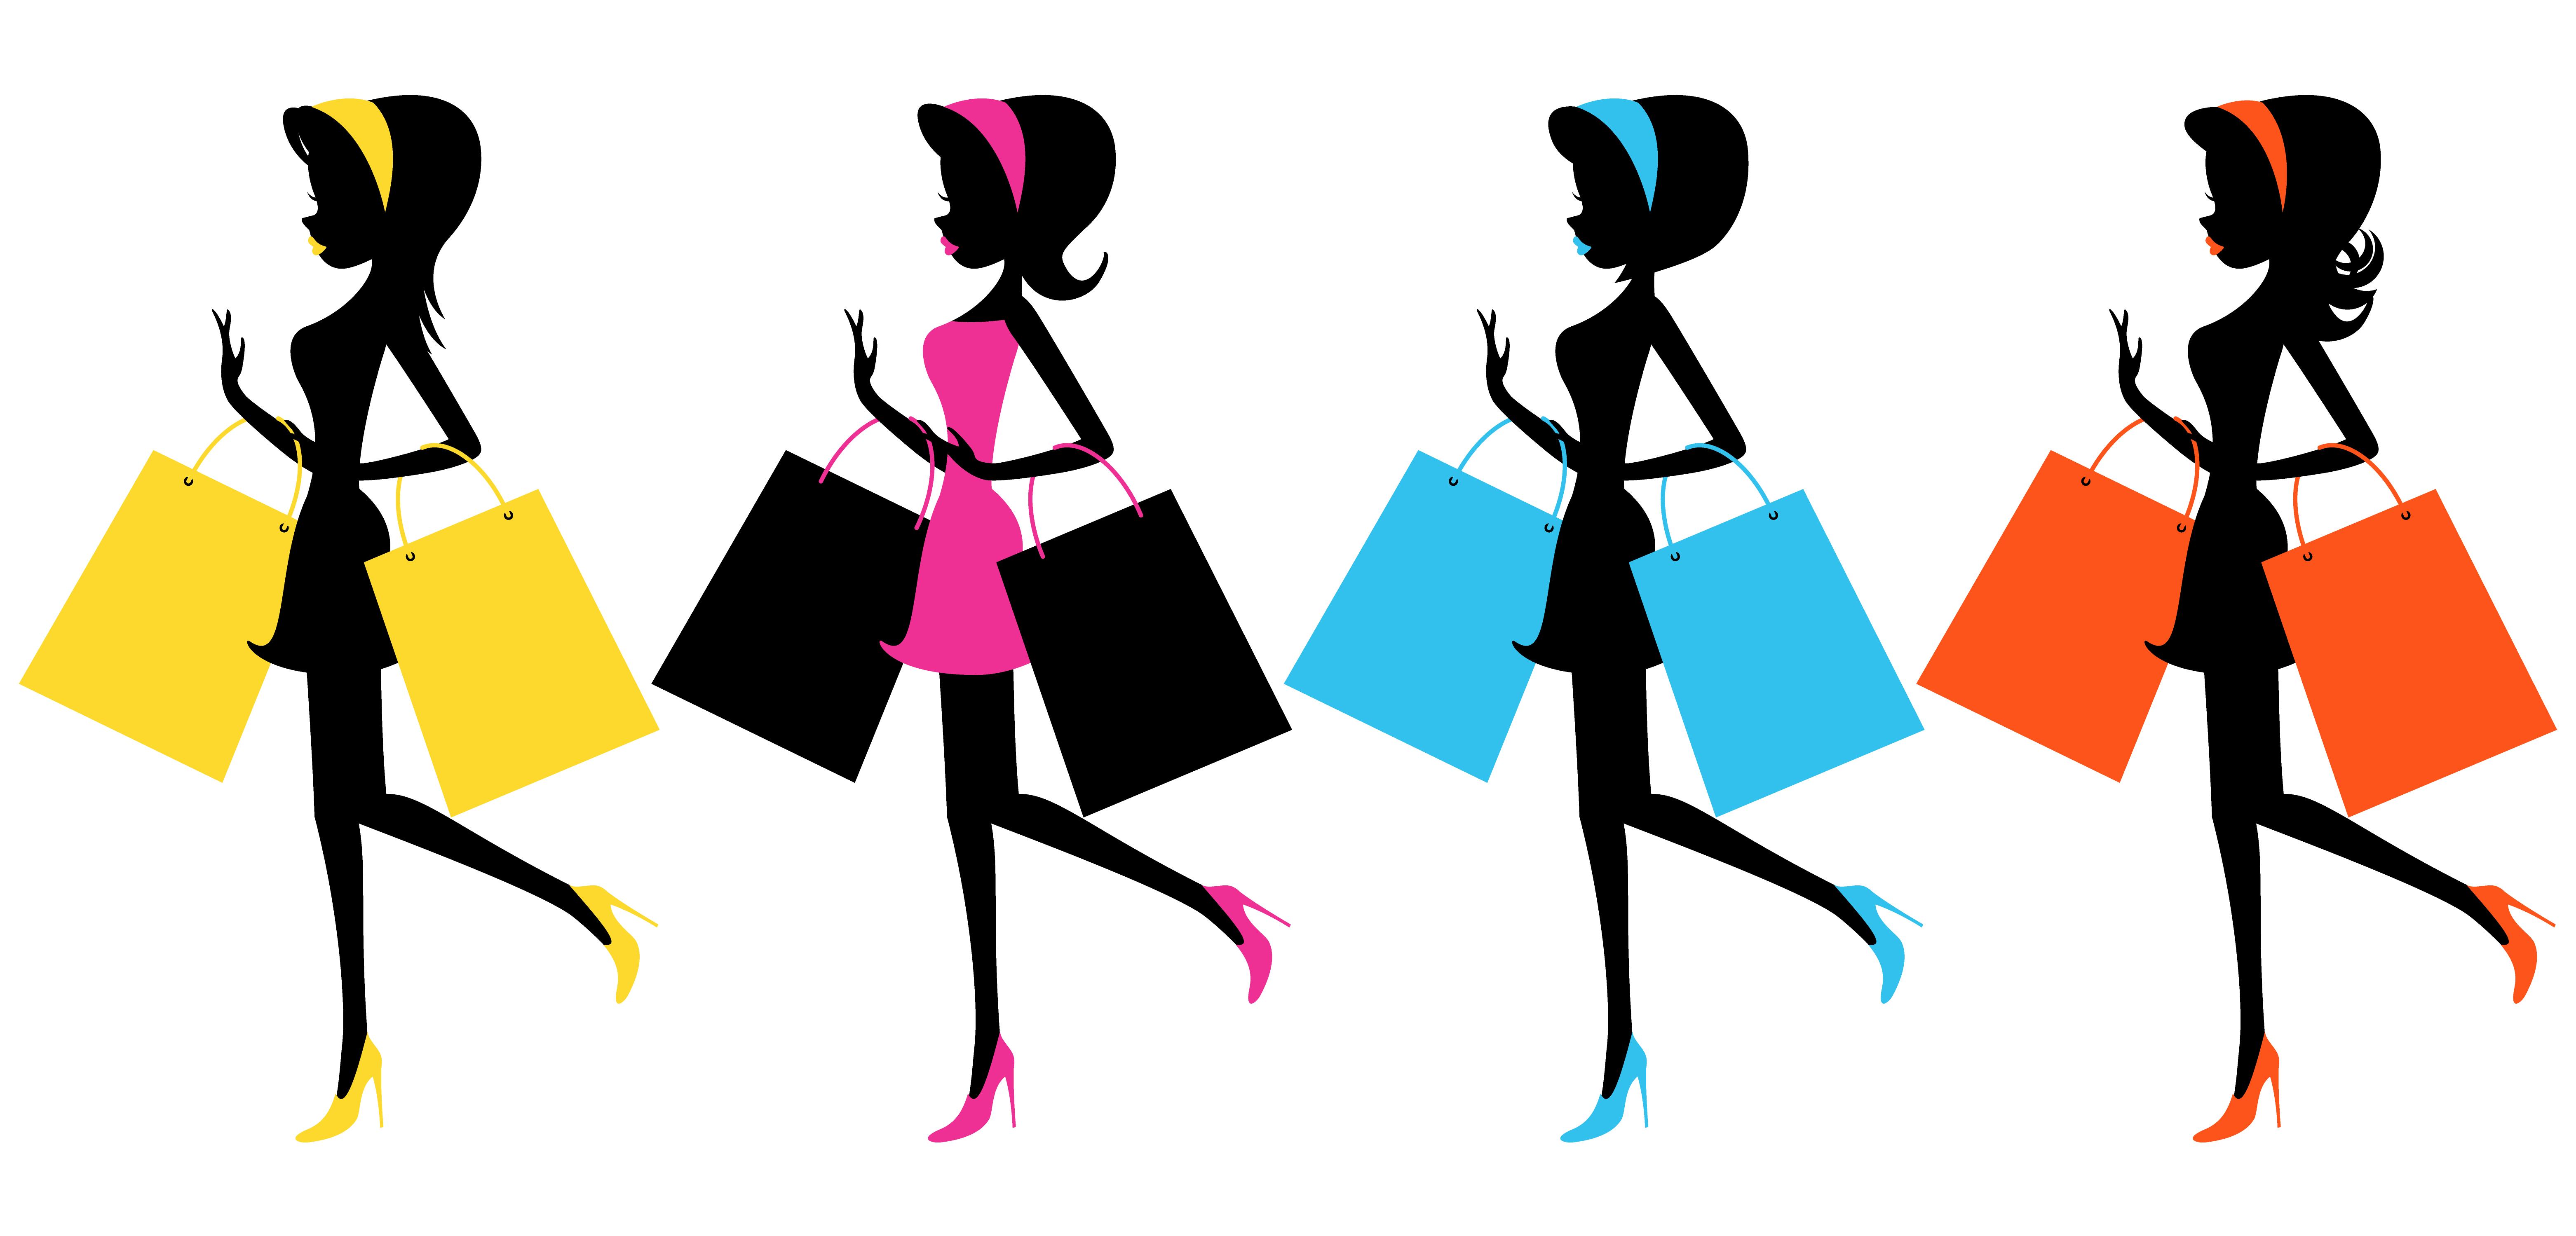 Friends shopping clipart 3.